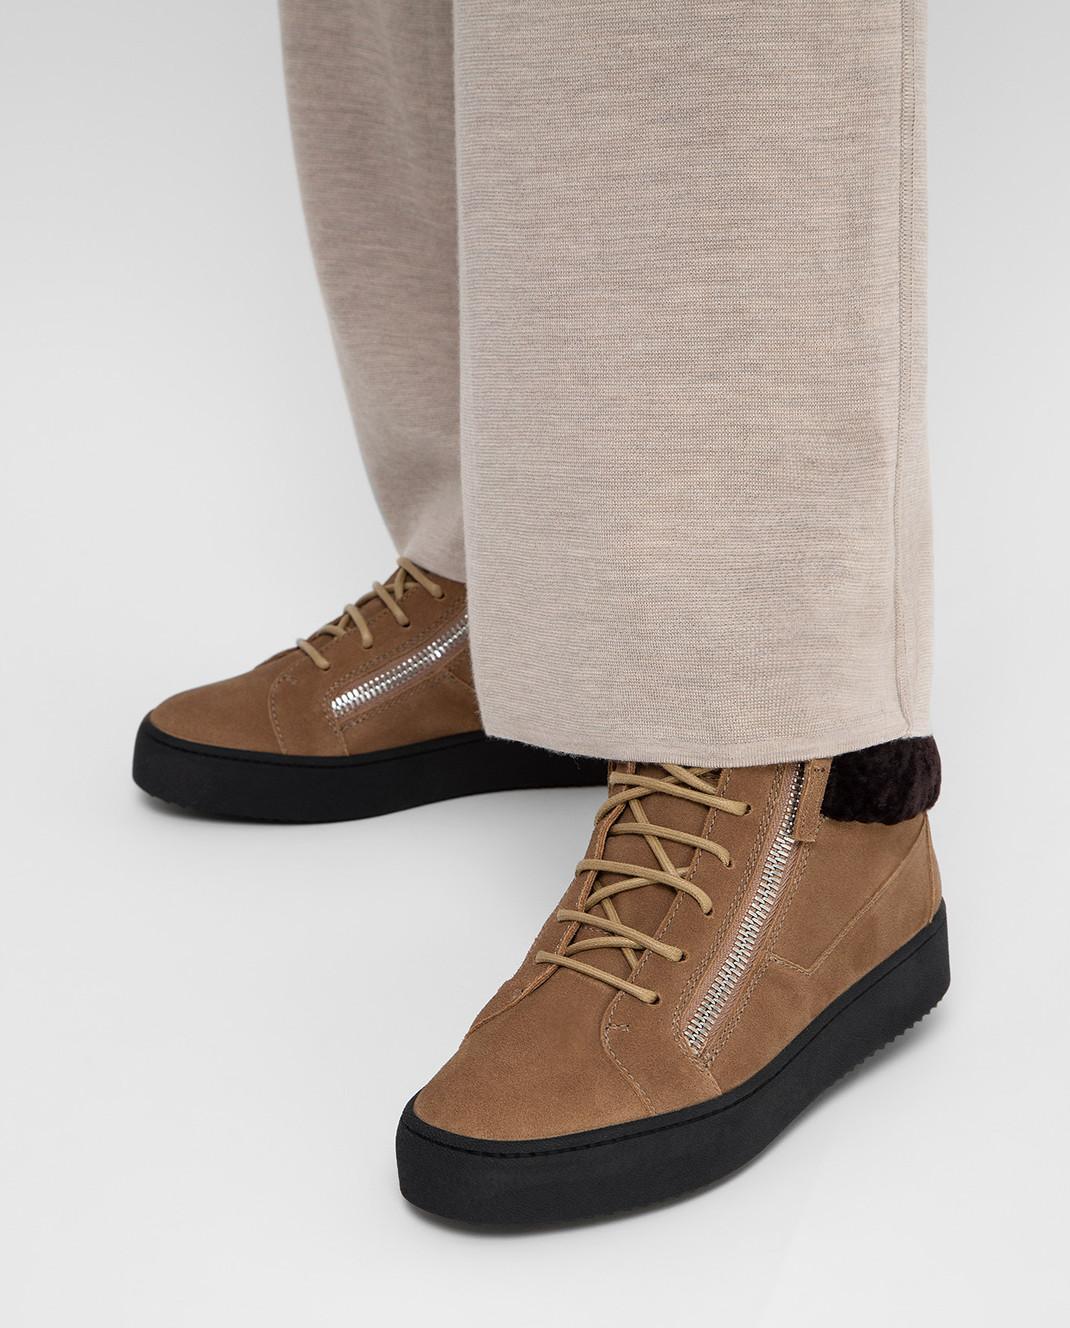 Giuseppe Zanotti Бежевые замшевые ботинки изображение 2